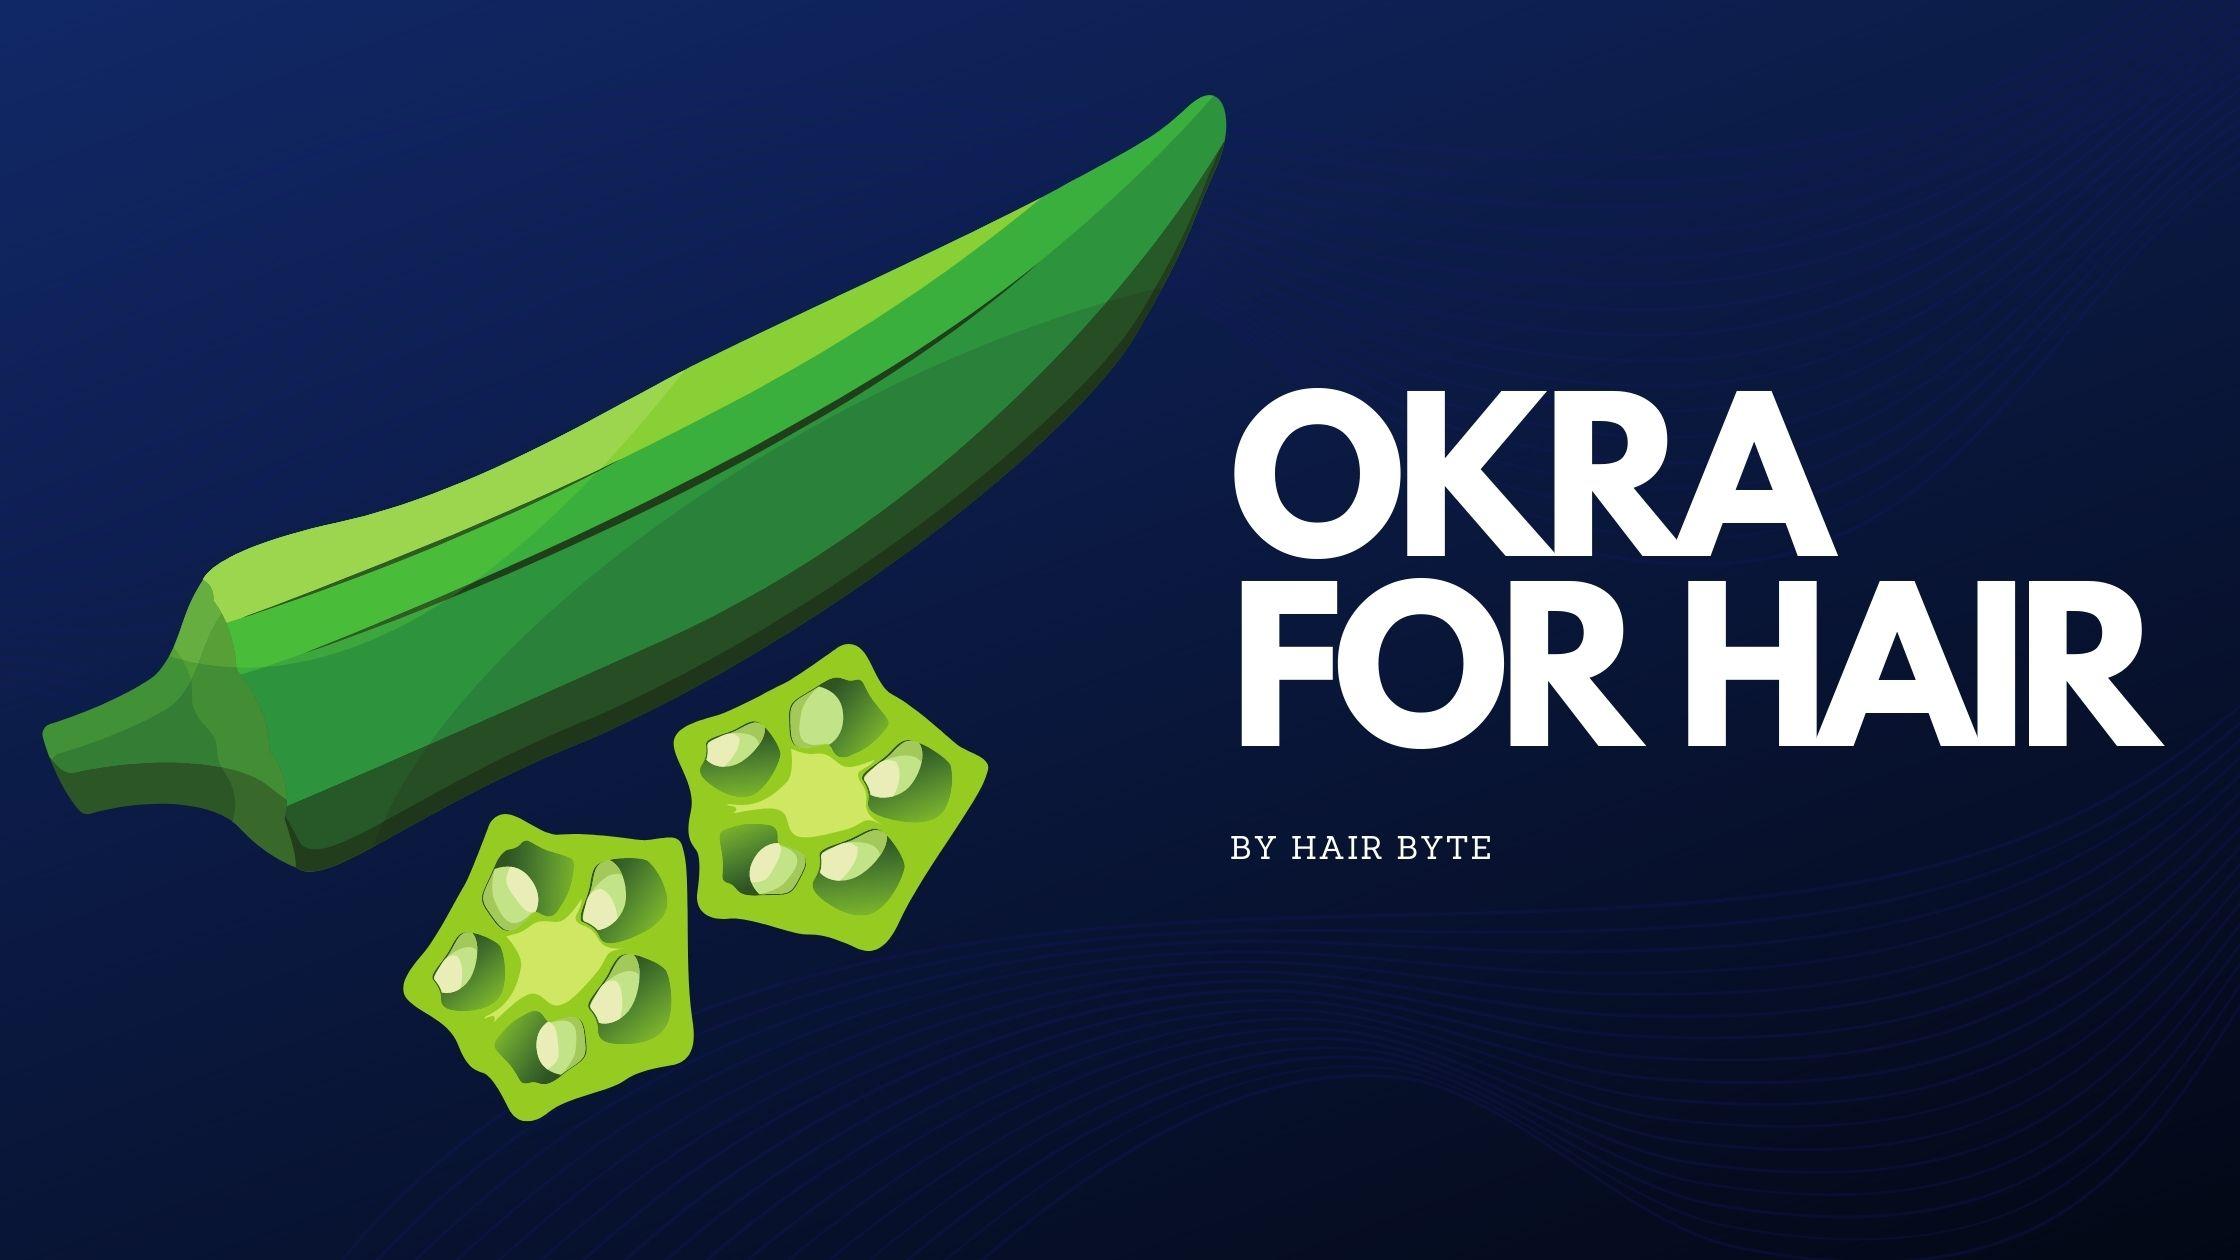 Okra For Hair